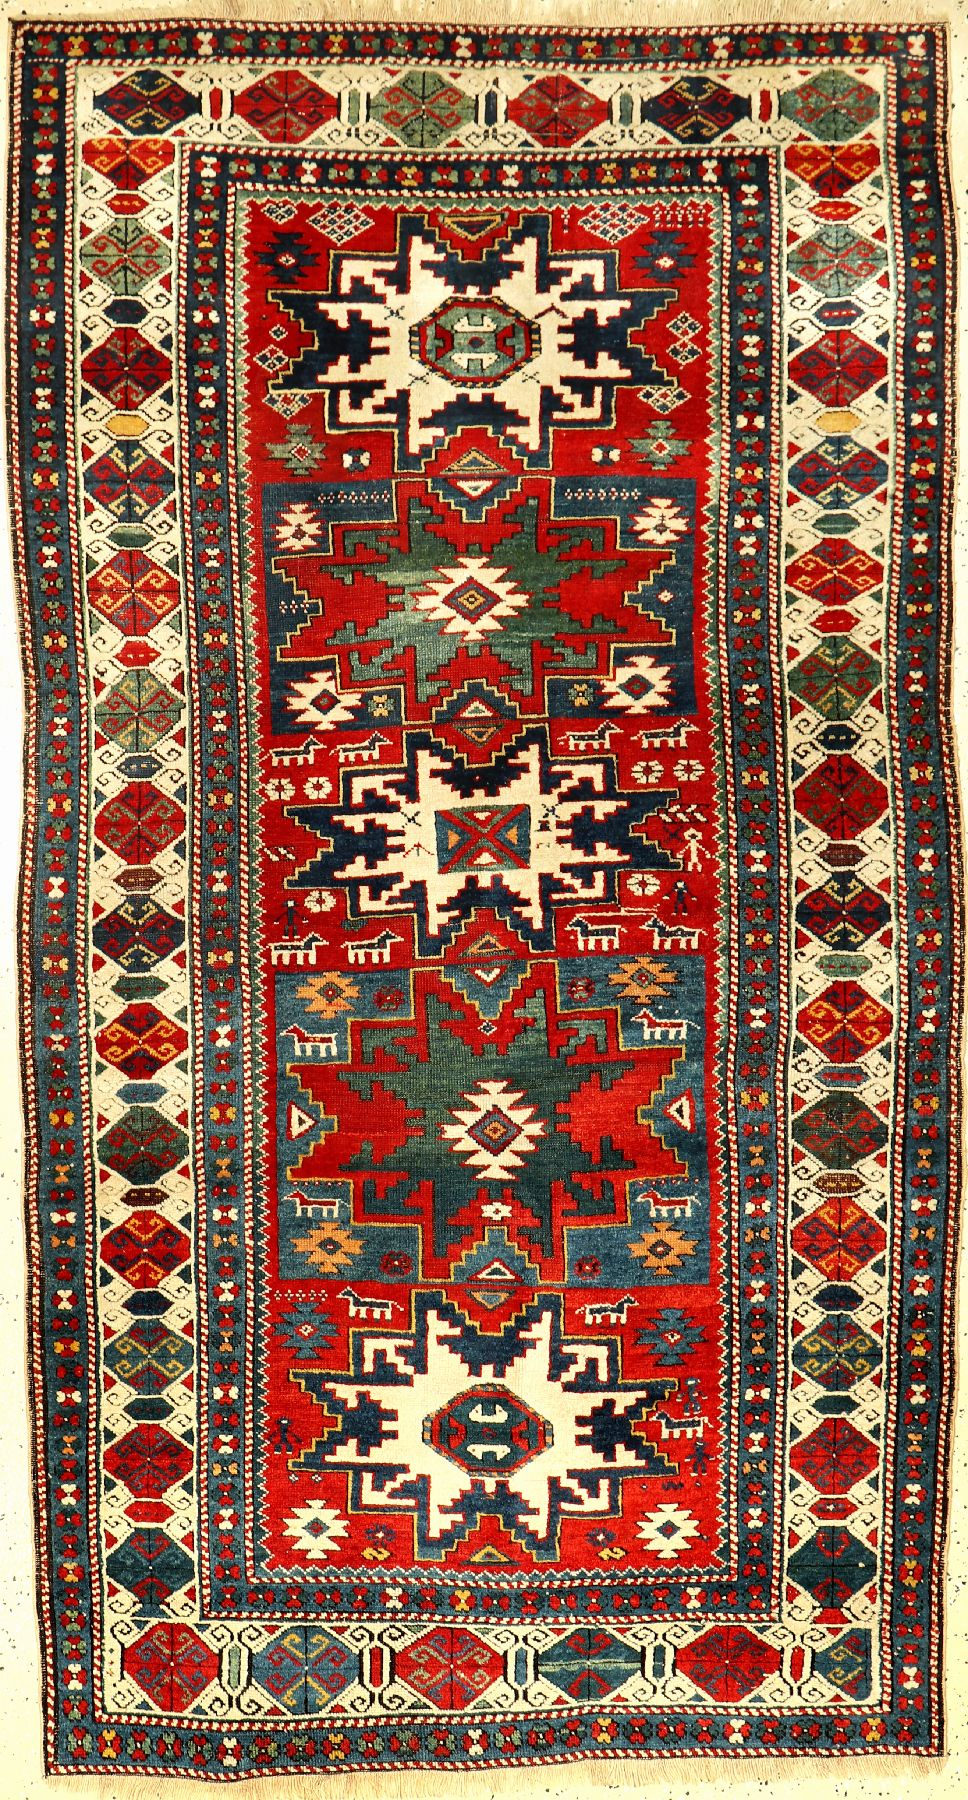 Kuba Shirvan antique, East Caucasus, 19th century, wool on wool, approx. 217 x 120 cm, rare,